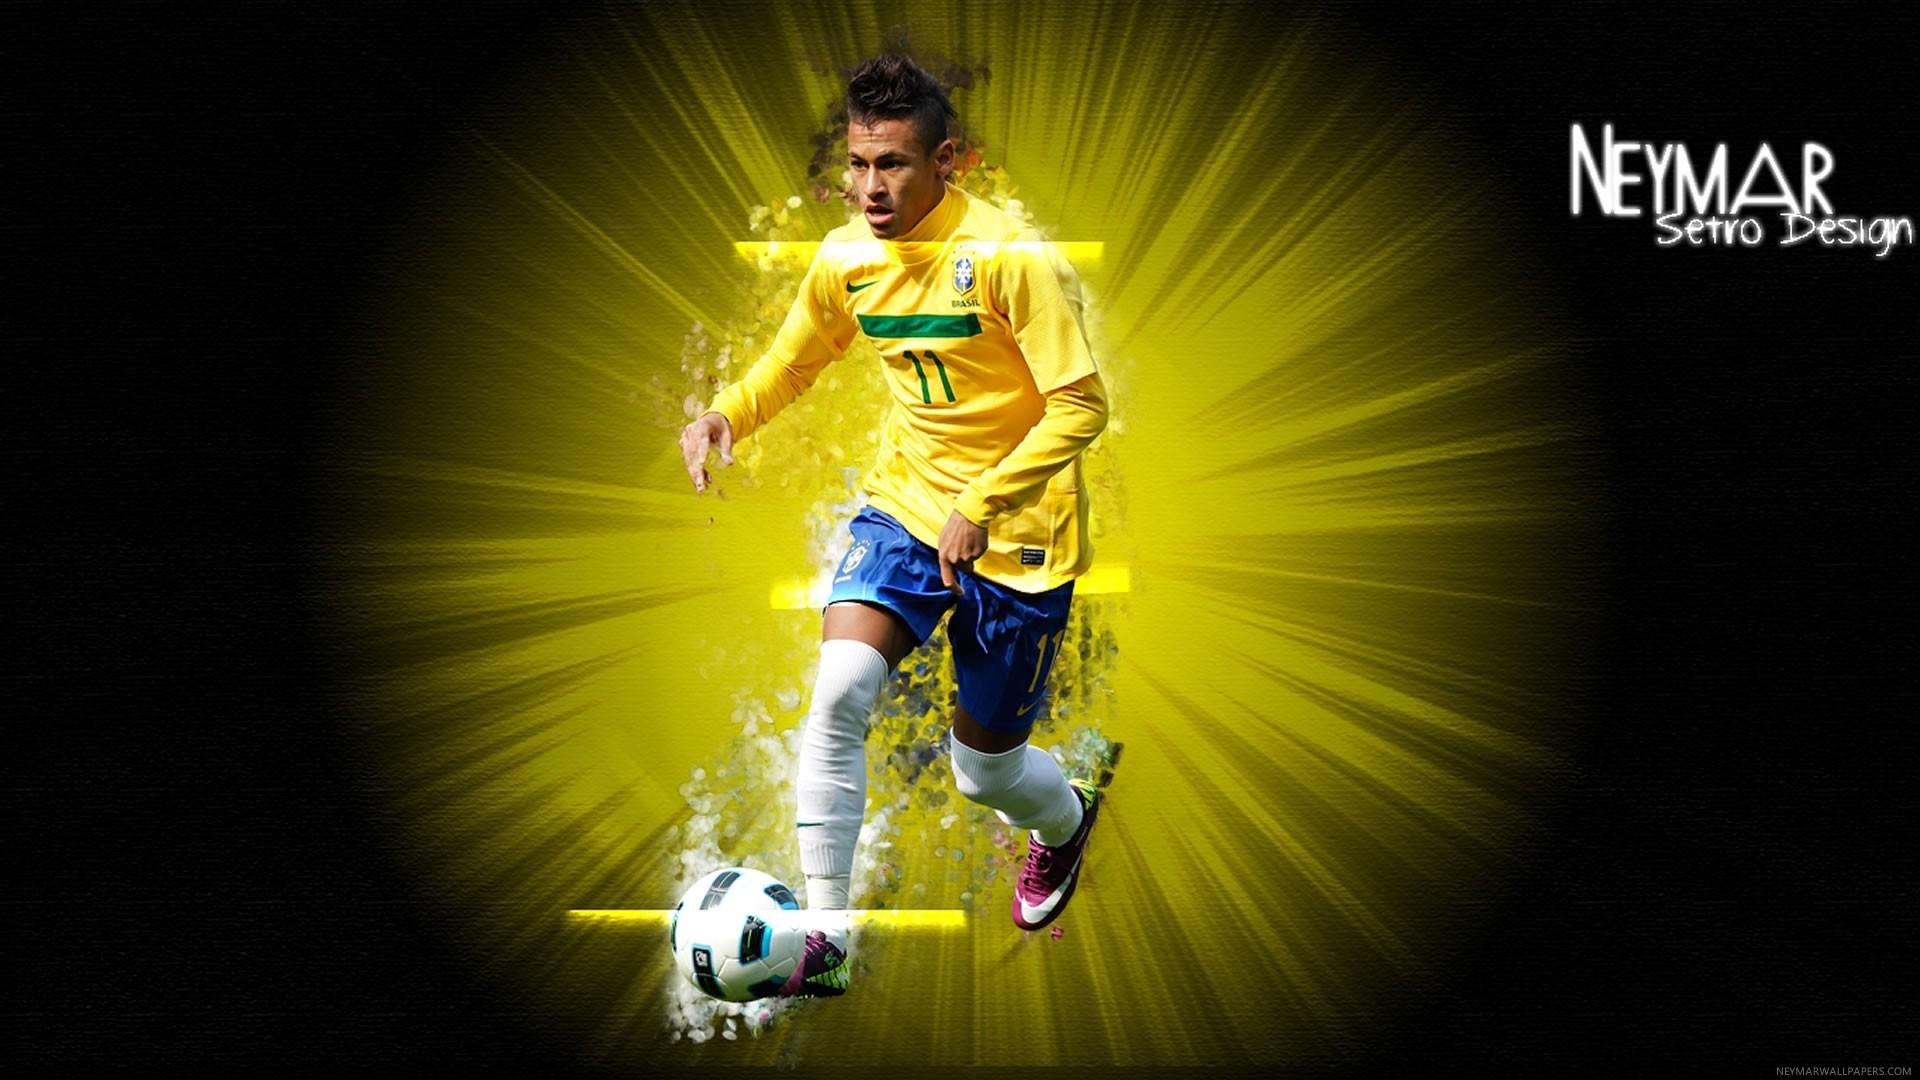 Neymar Jr Wallpaper theme